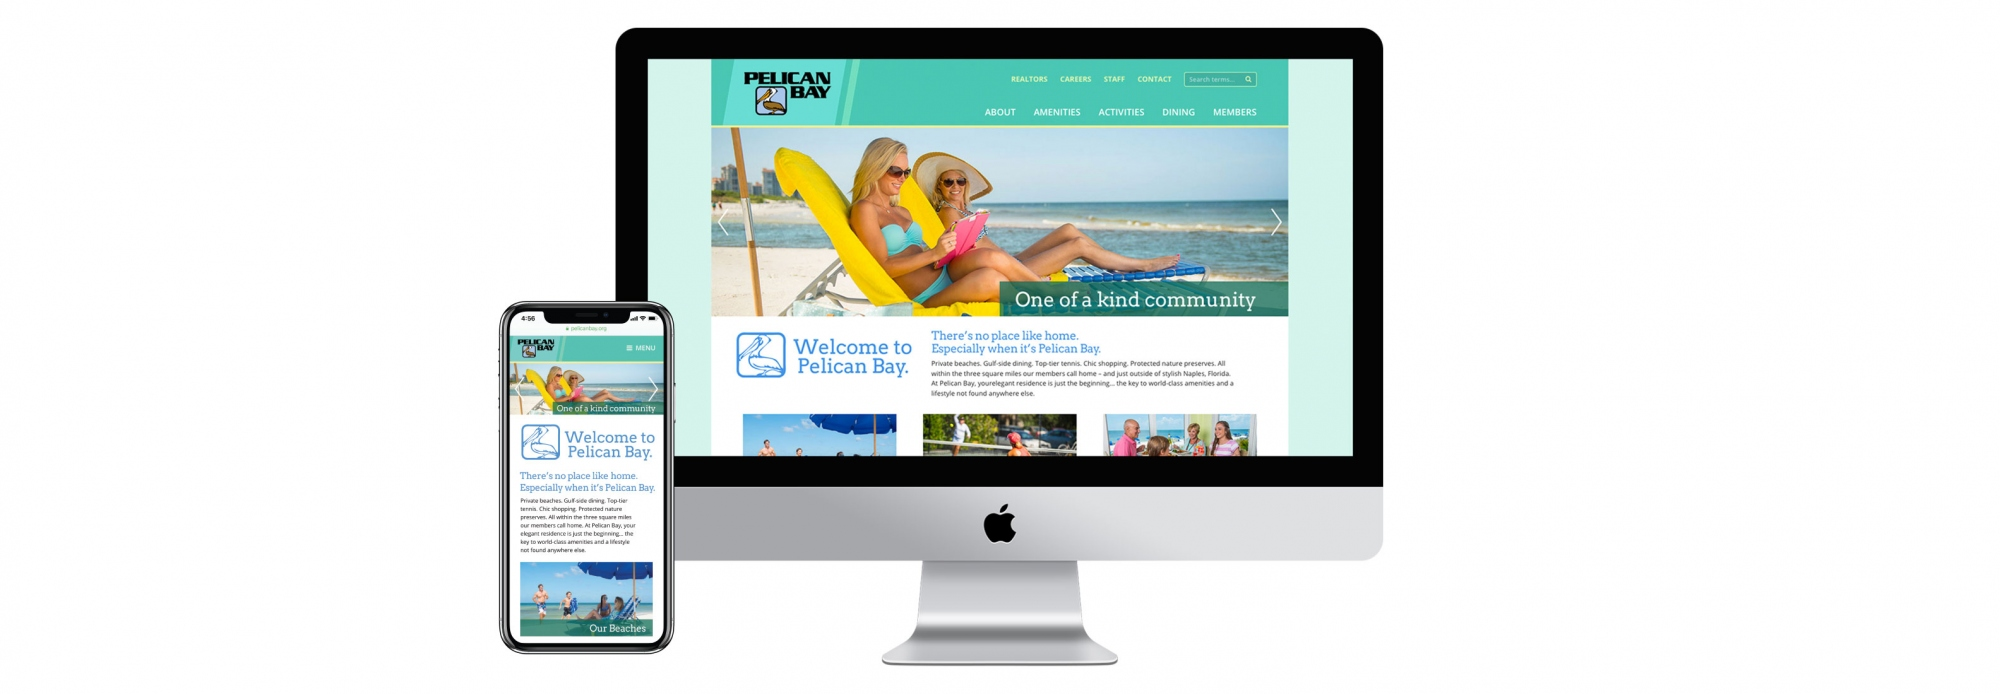 Pelican Bay Website image on desktop and mobile